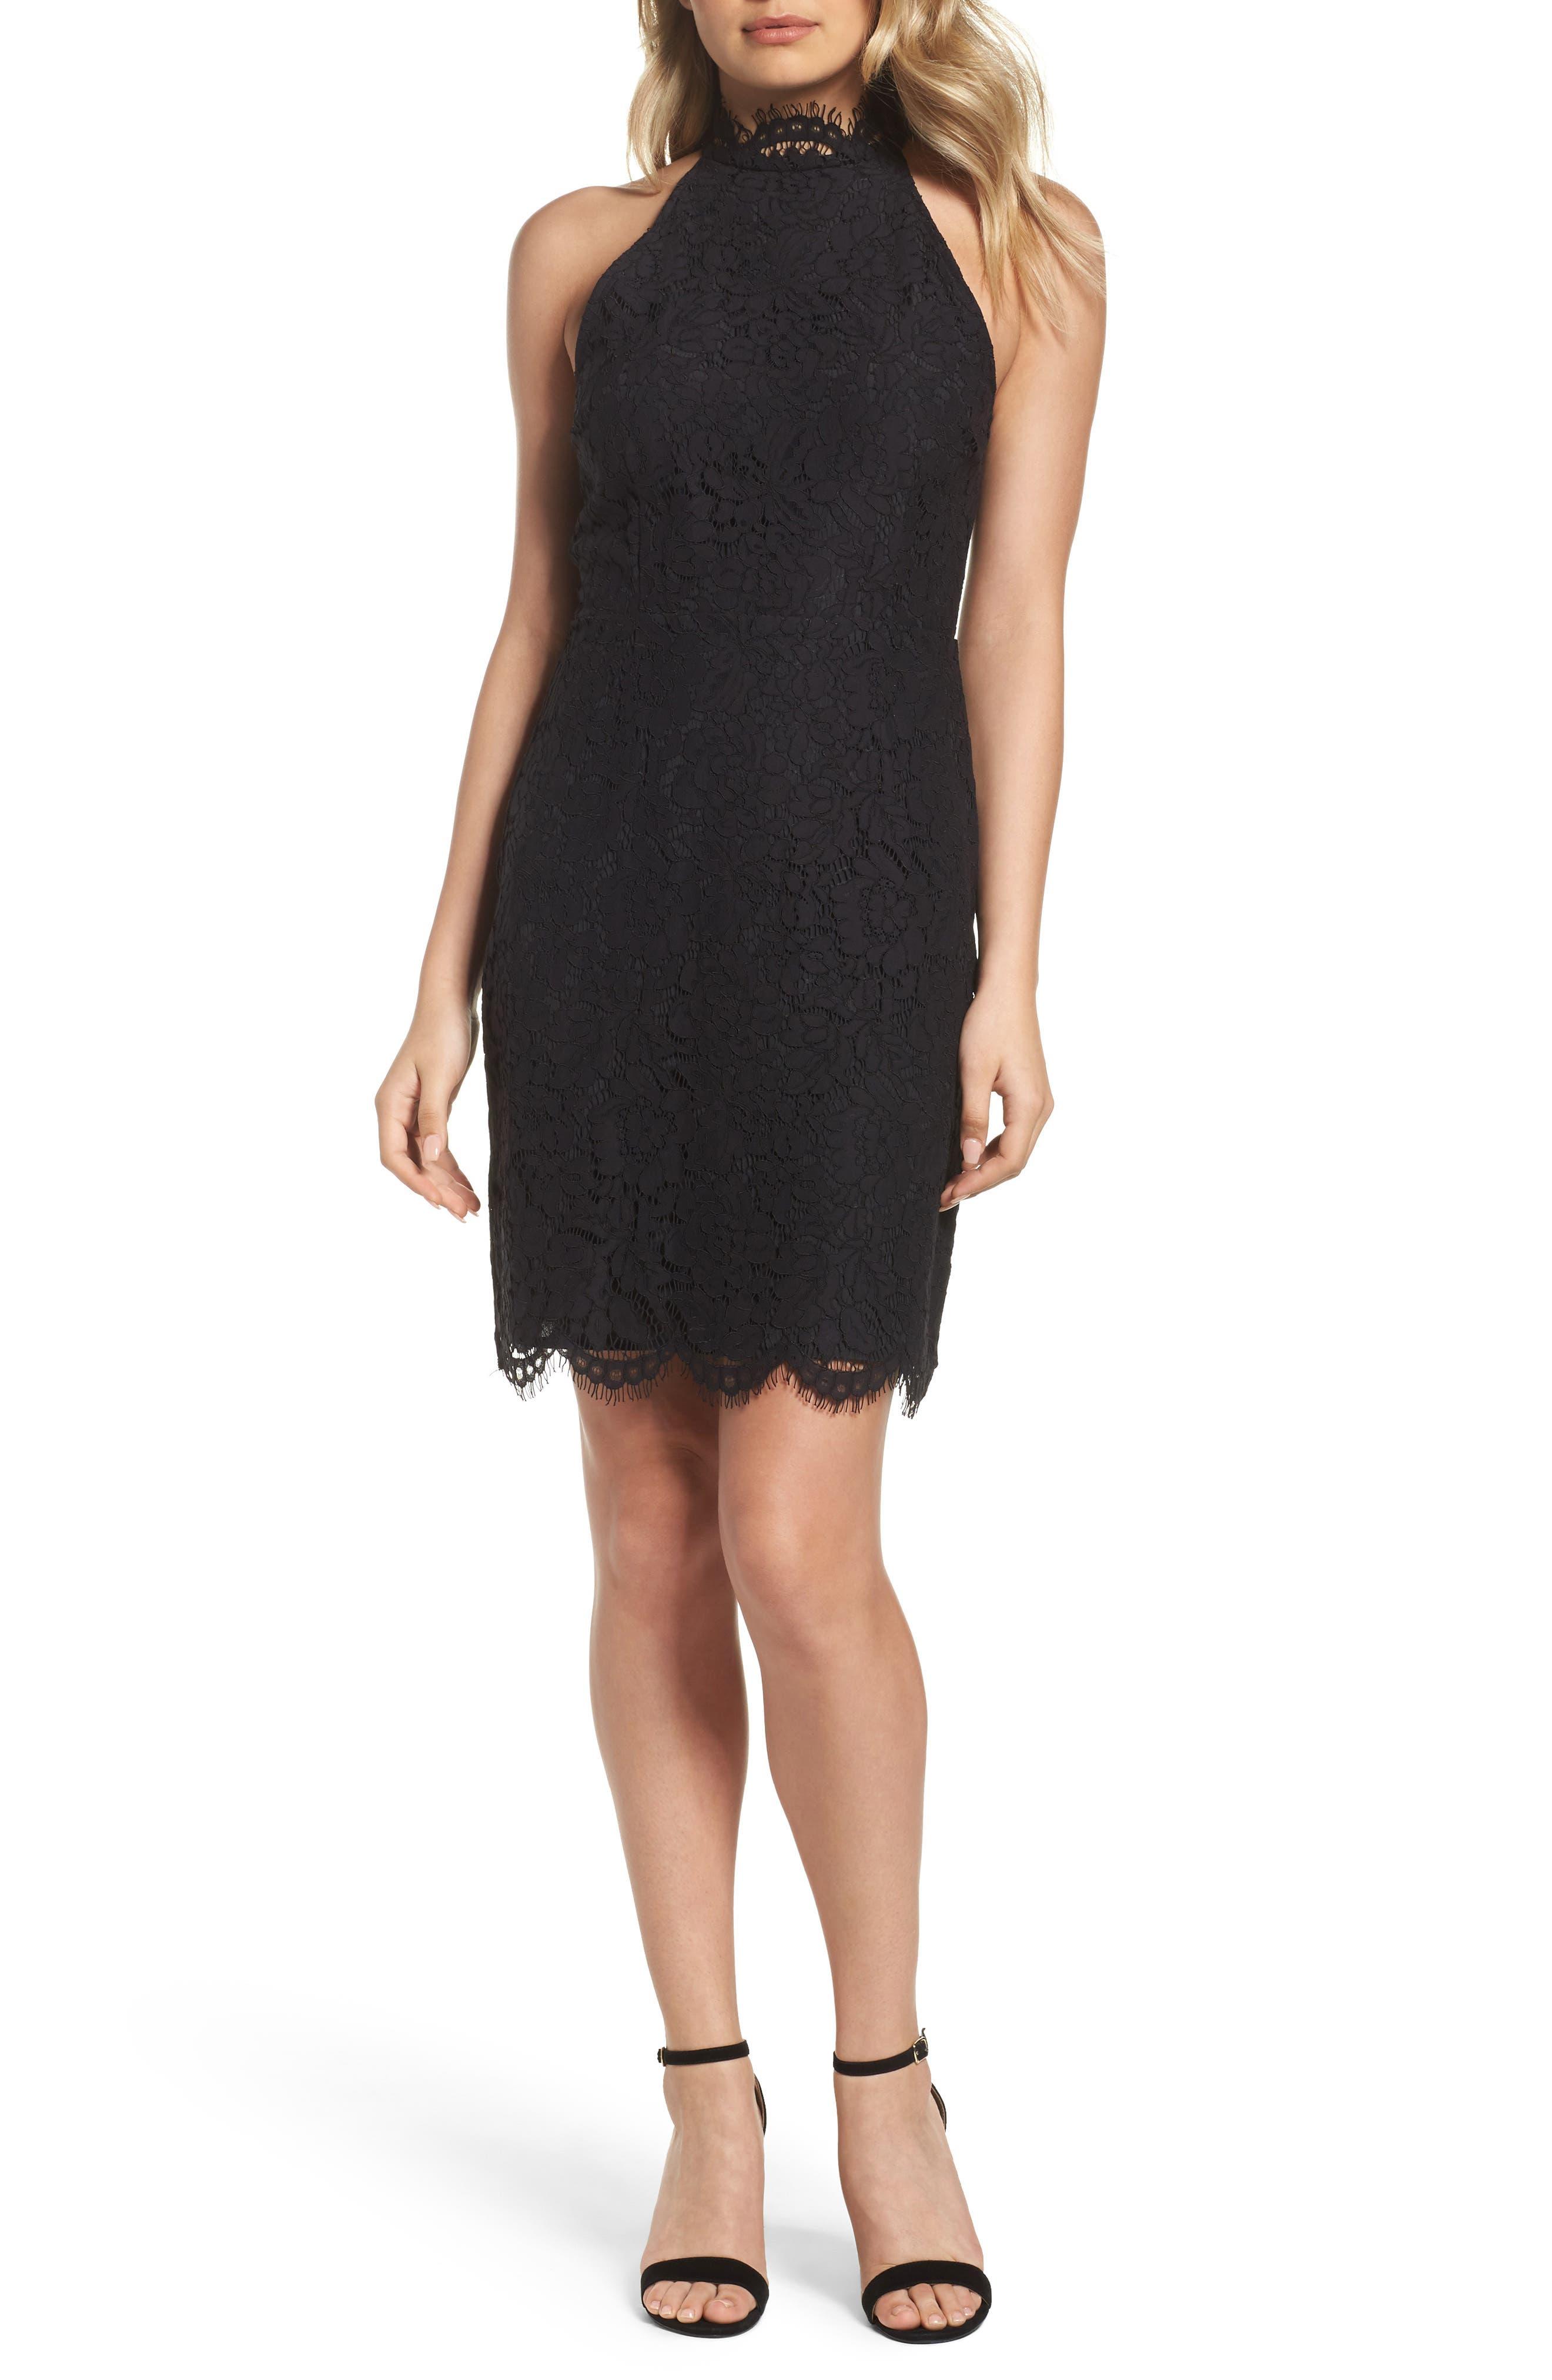 Bb Dakota Cara High Neck Lace Cocktail Dress, Black